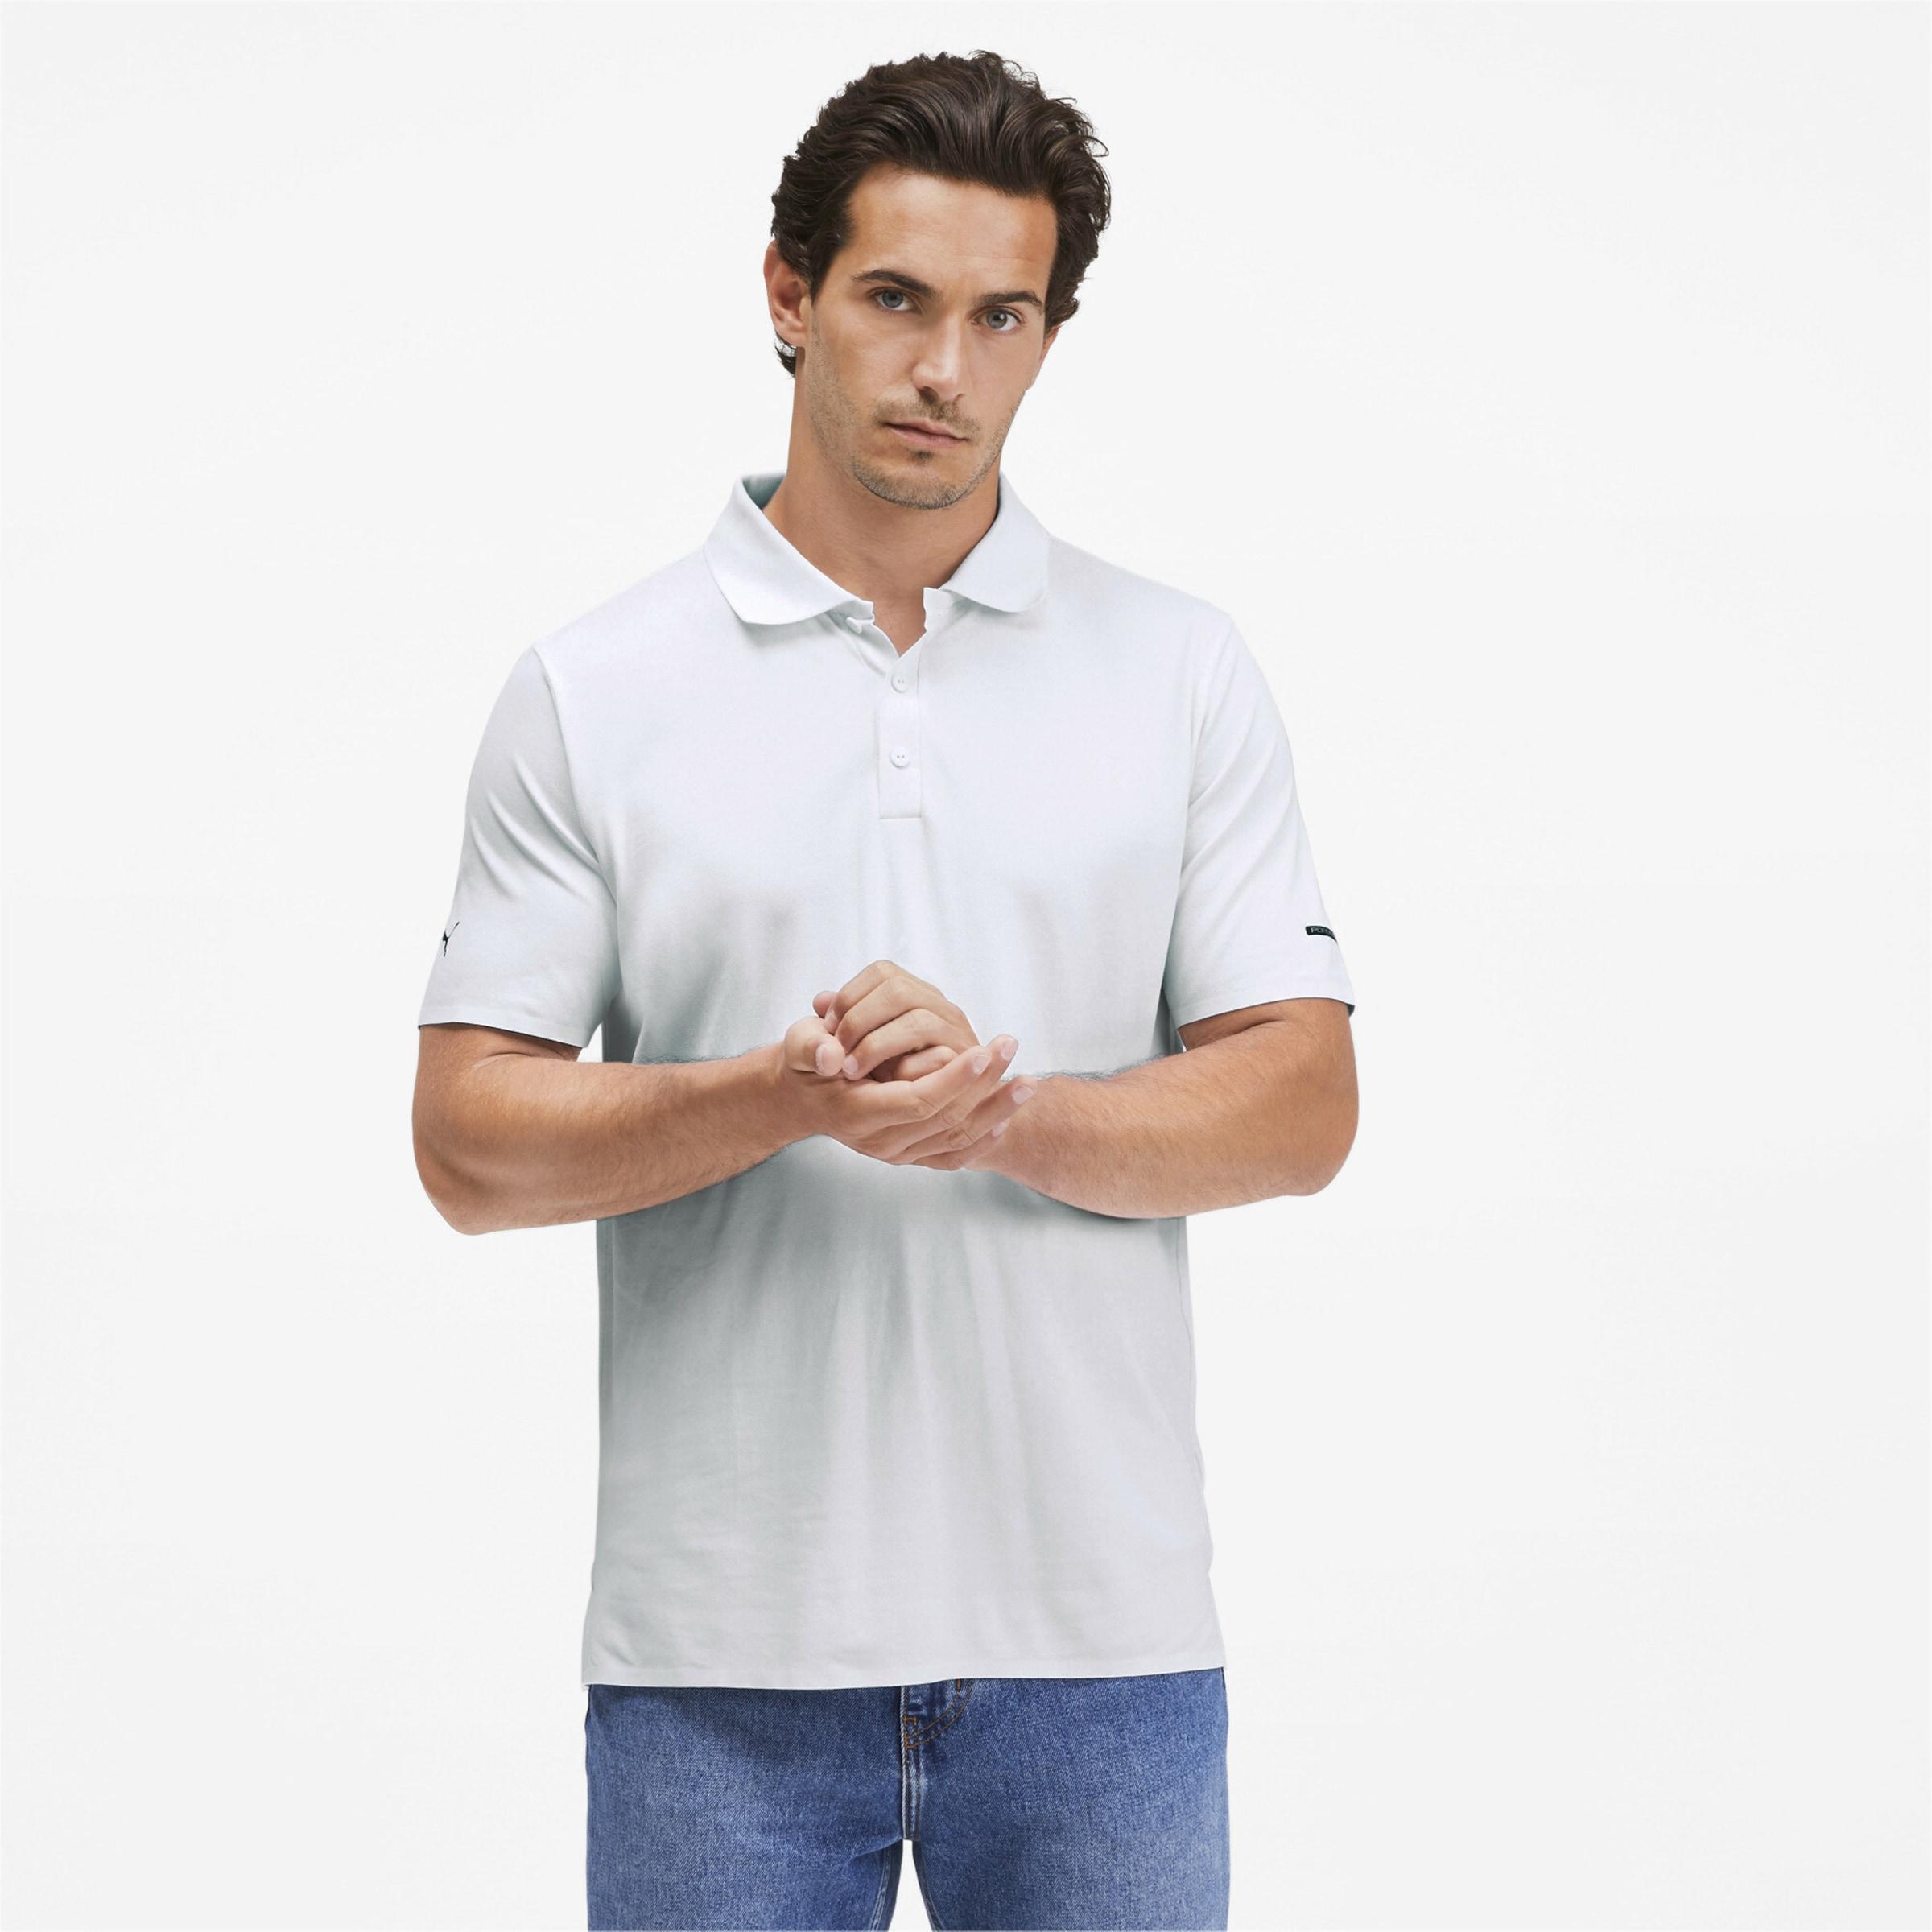 PUMA Porsche Design Herren Polo in weiß Synthetik 4062449486728